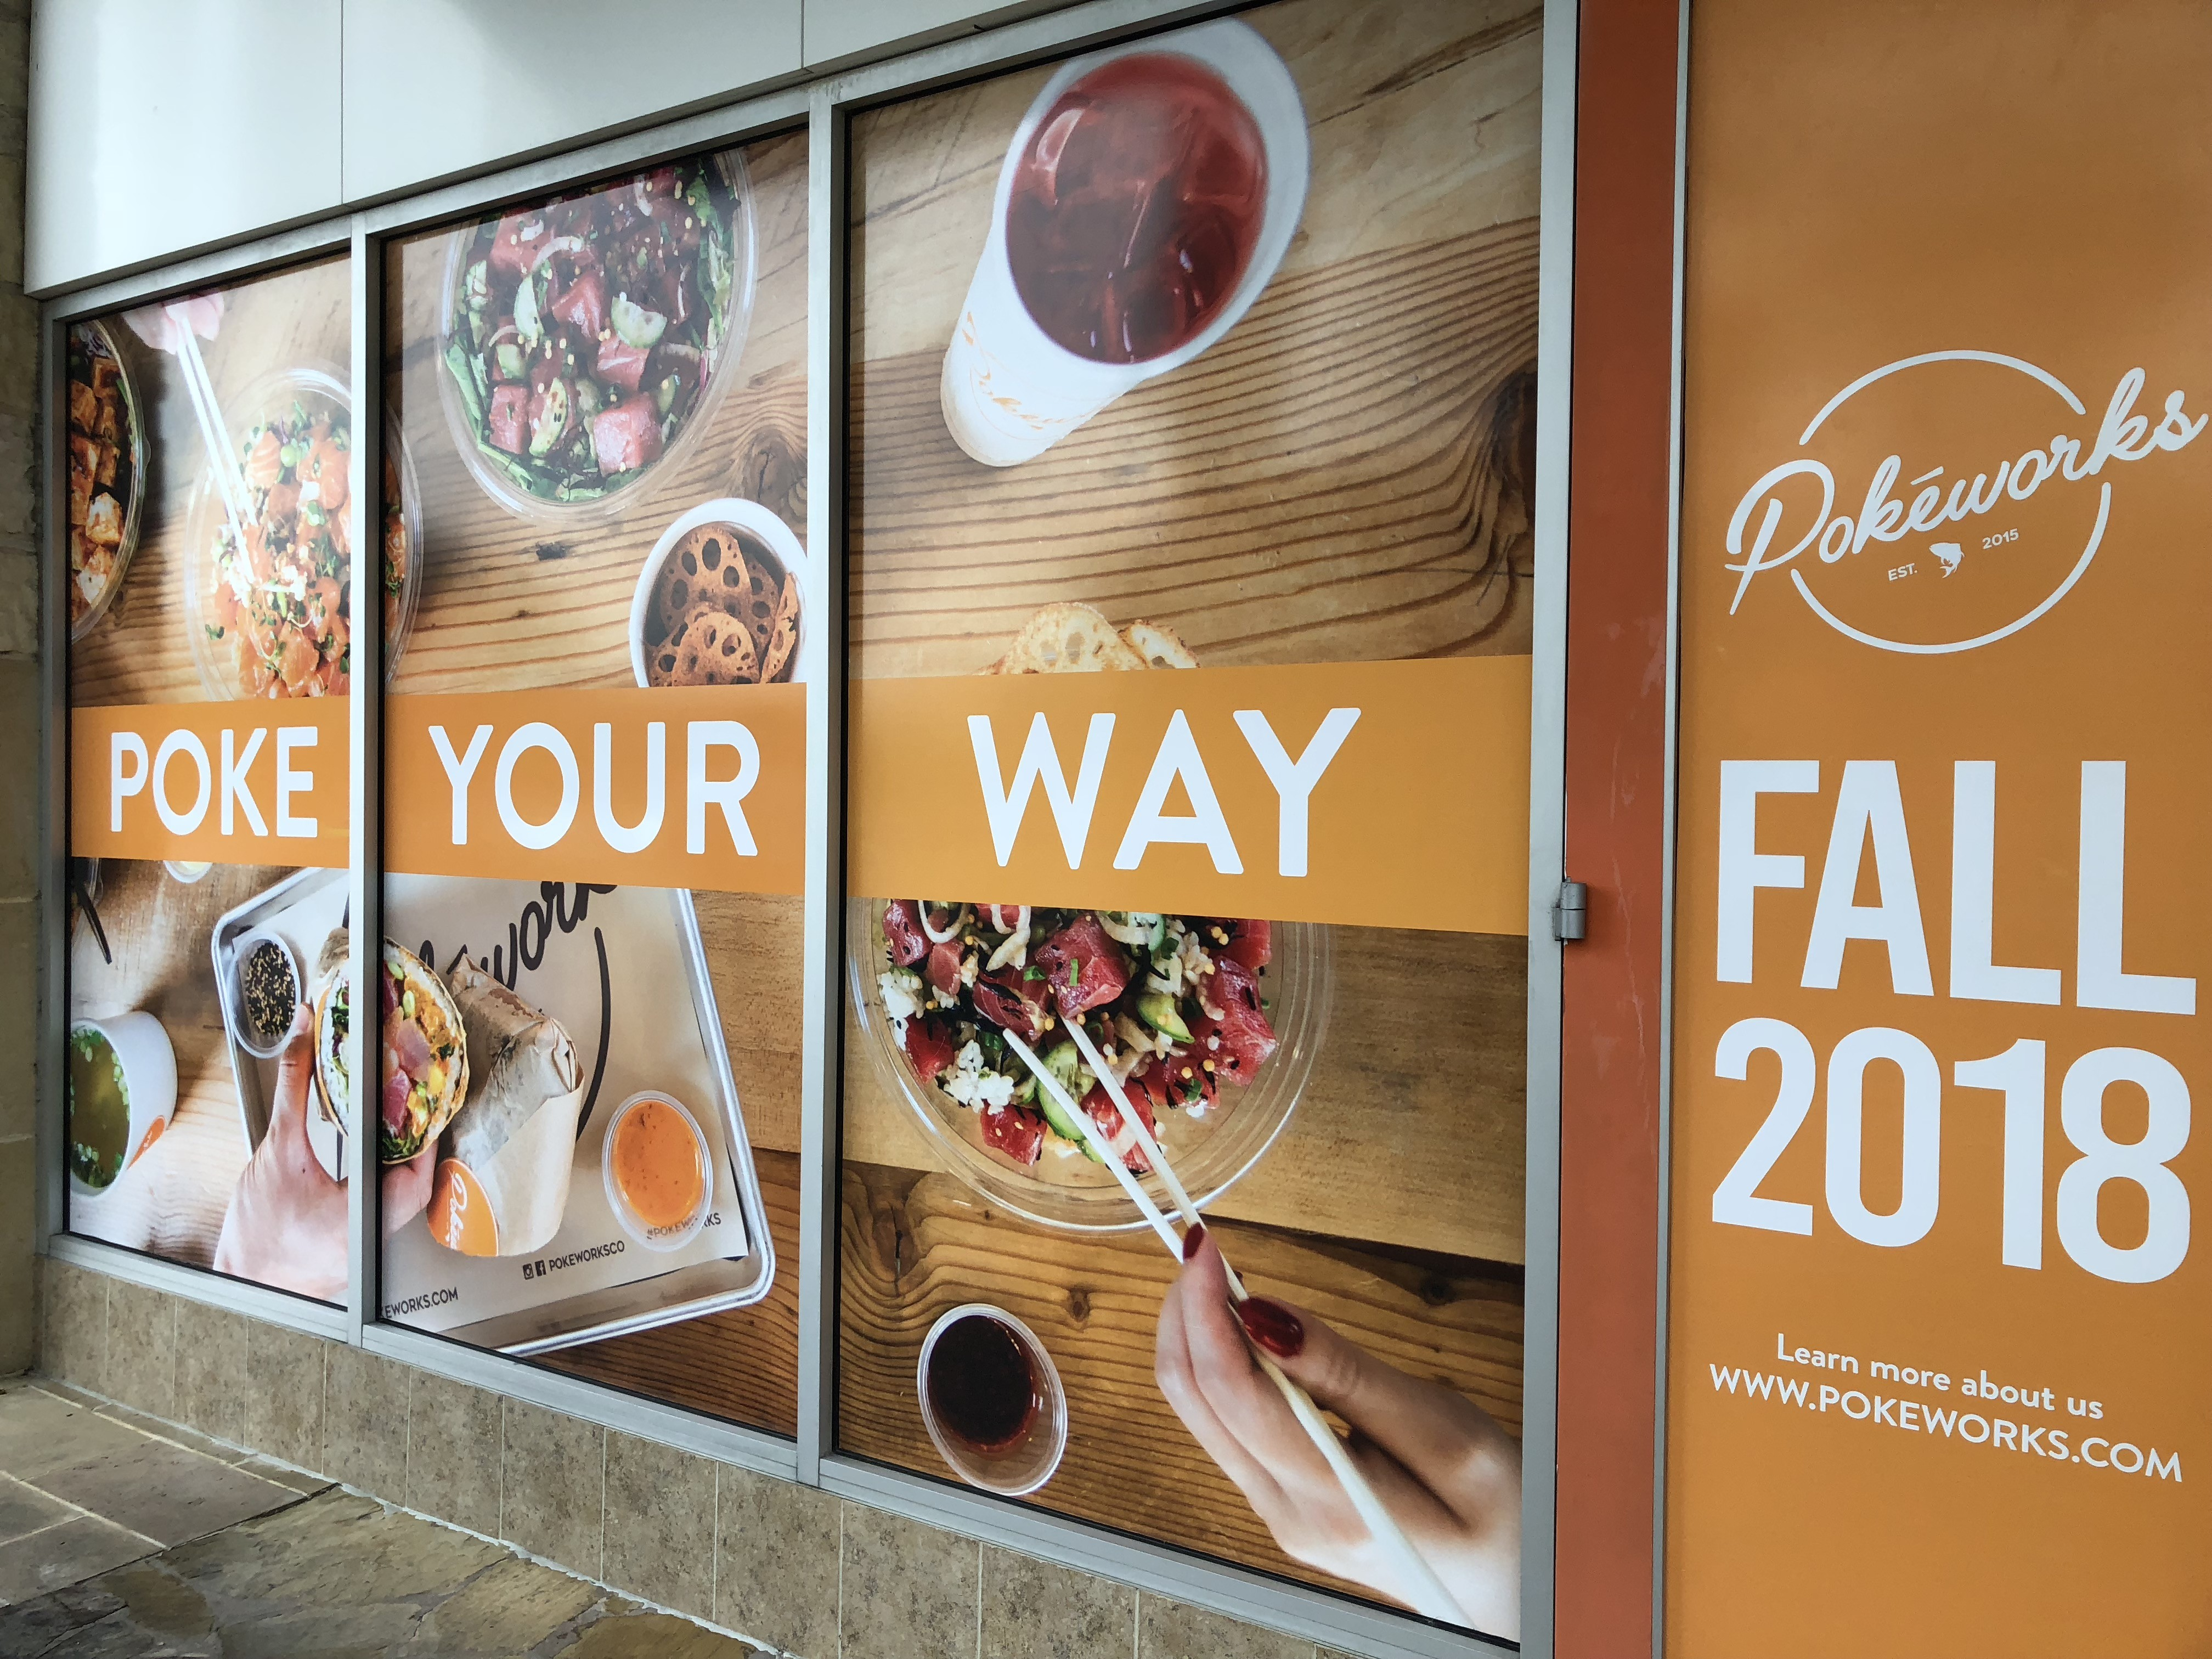 Manhattan based Poke Shop Is Expanding to San Antonio | Flavor